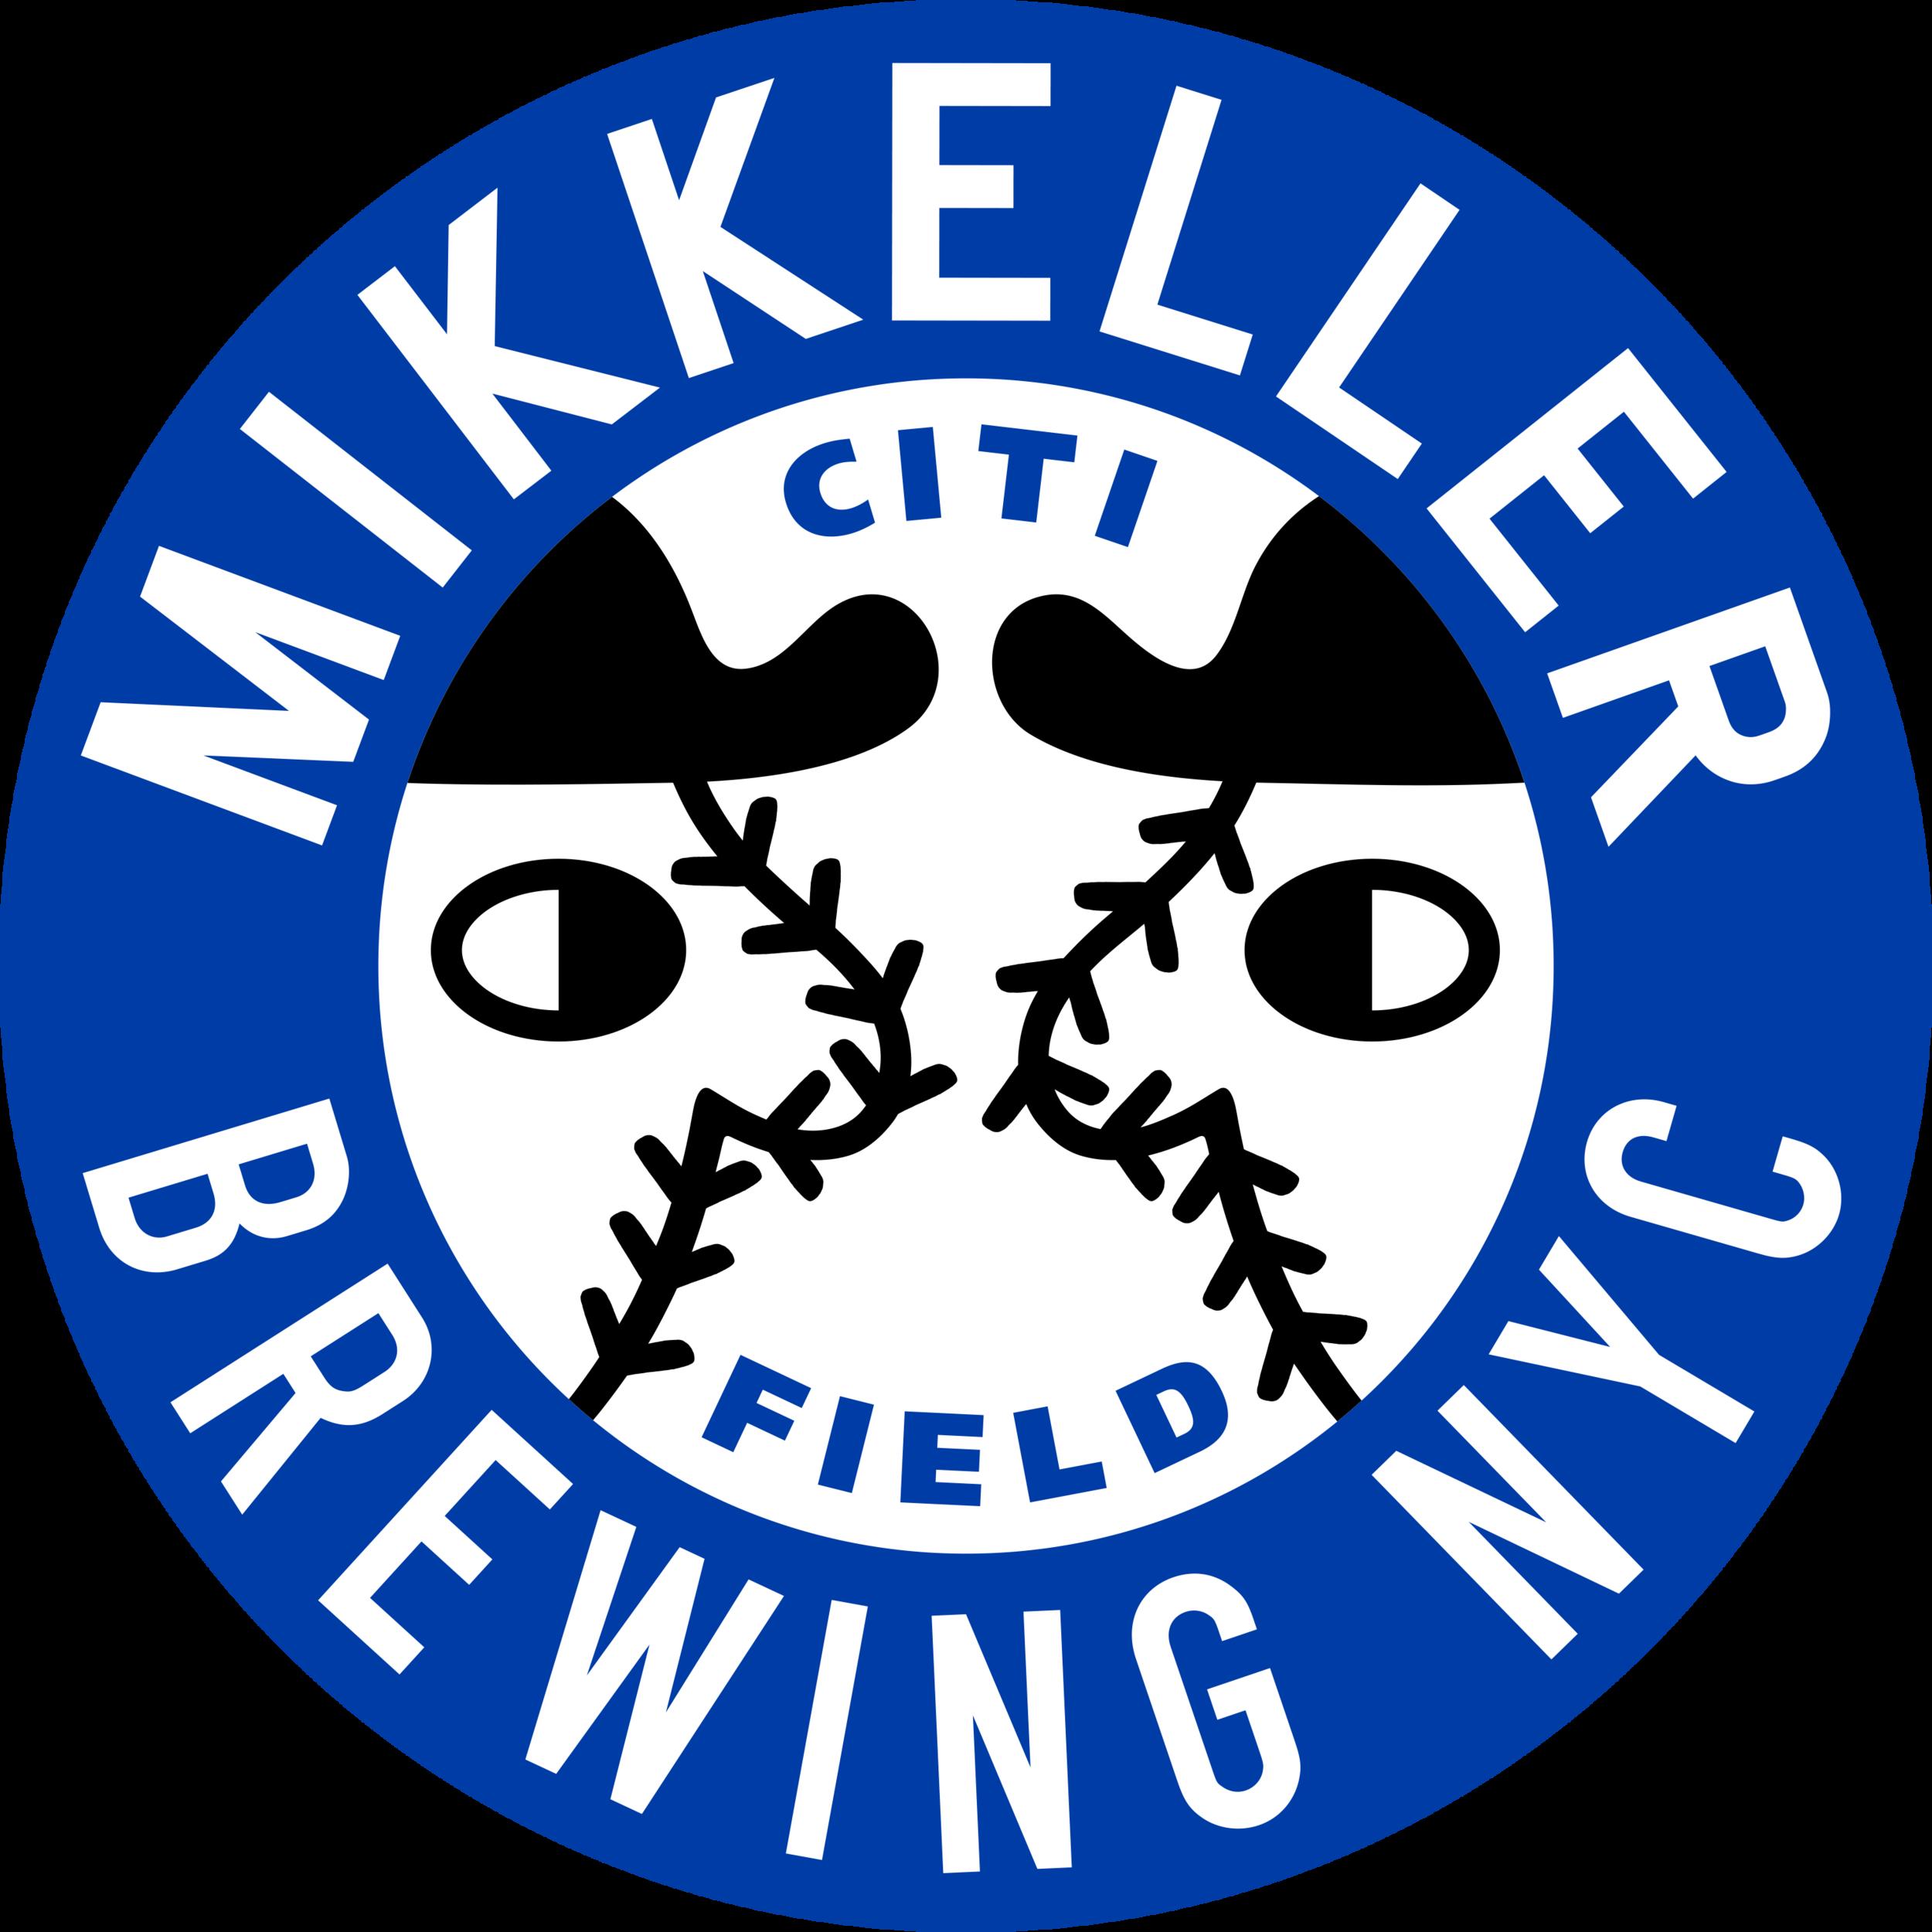 MKNYC.circ.logo.2color (2).png